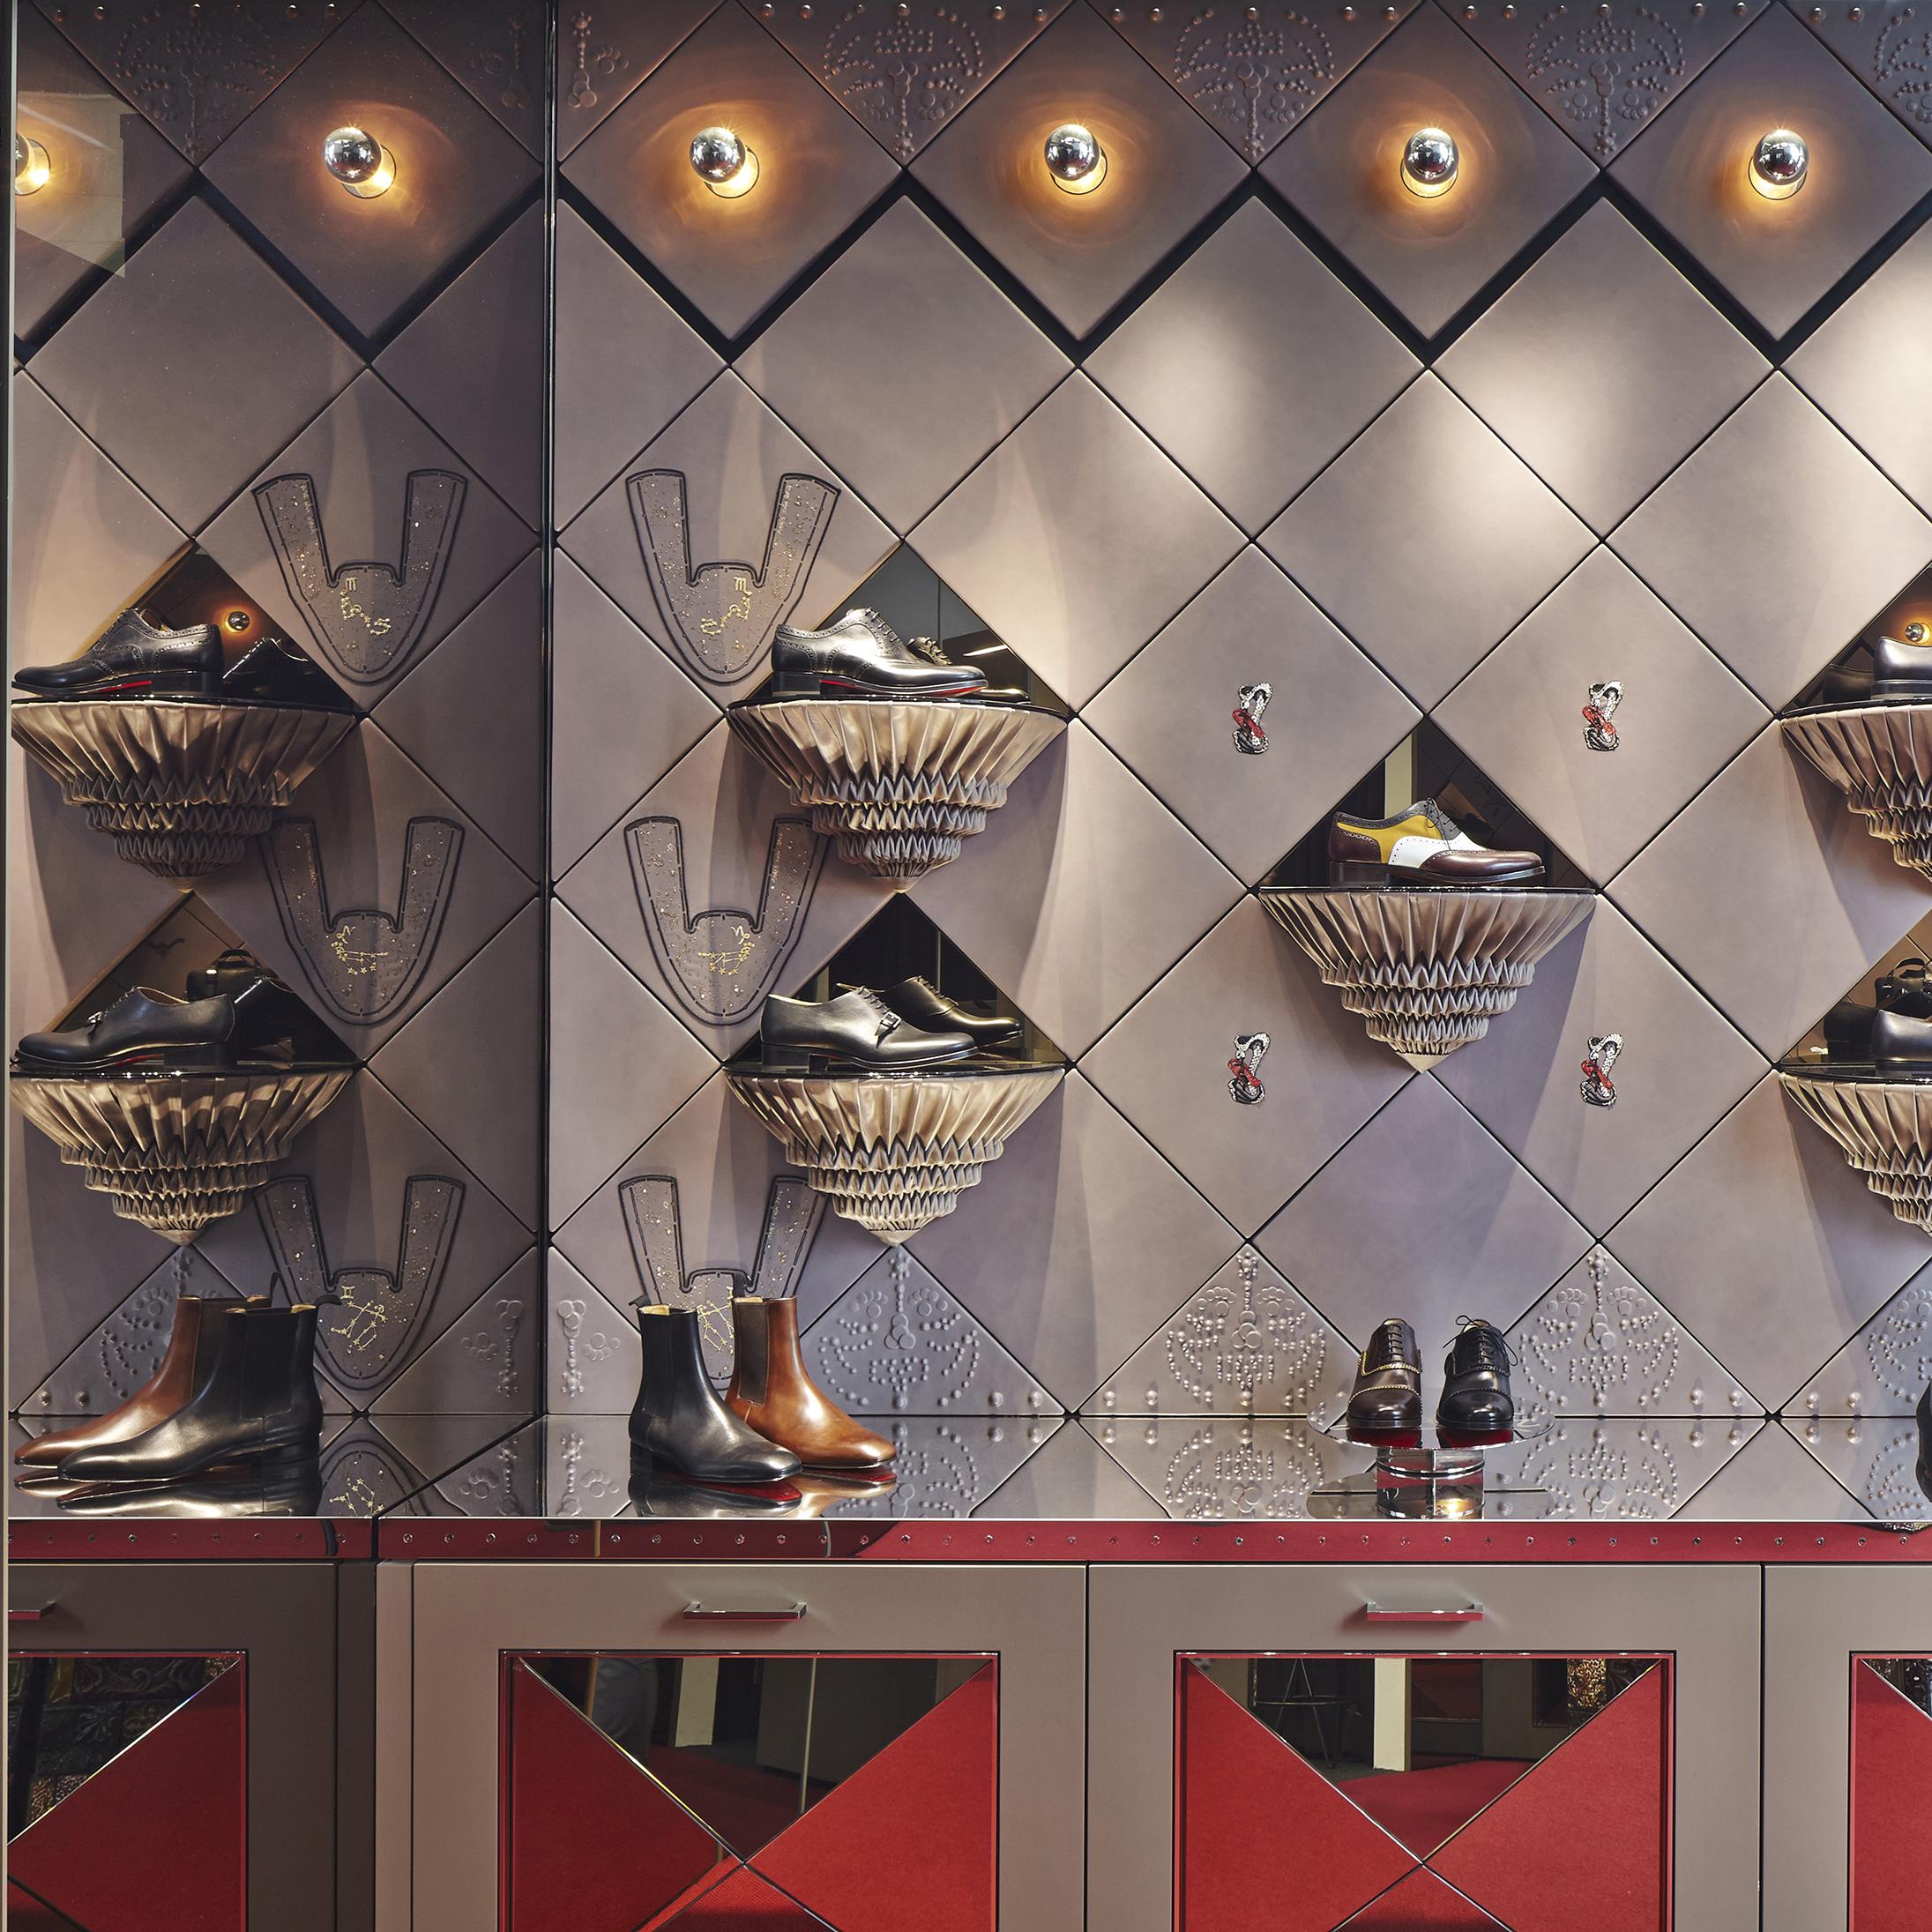 Louboutin Milan Men Store 5 漏 A13 Studio  Andrea Mariani - Roberta Levib.jpg